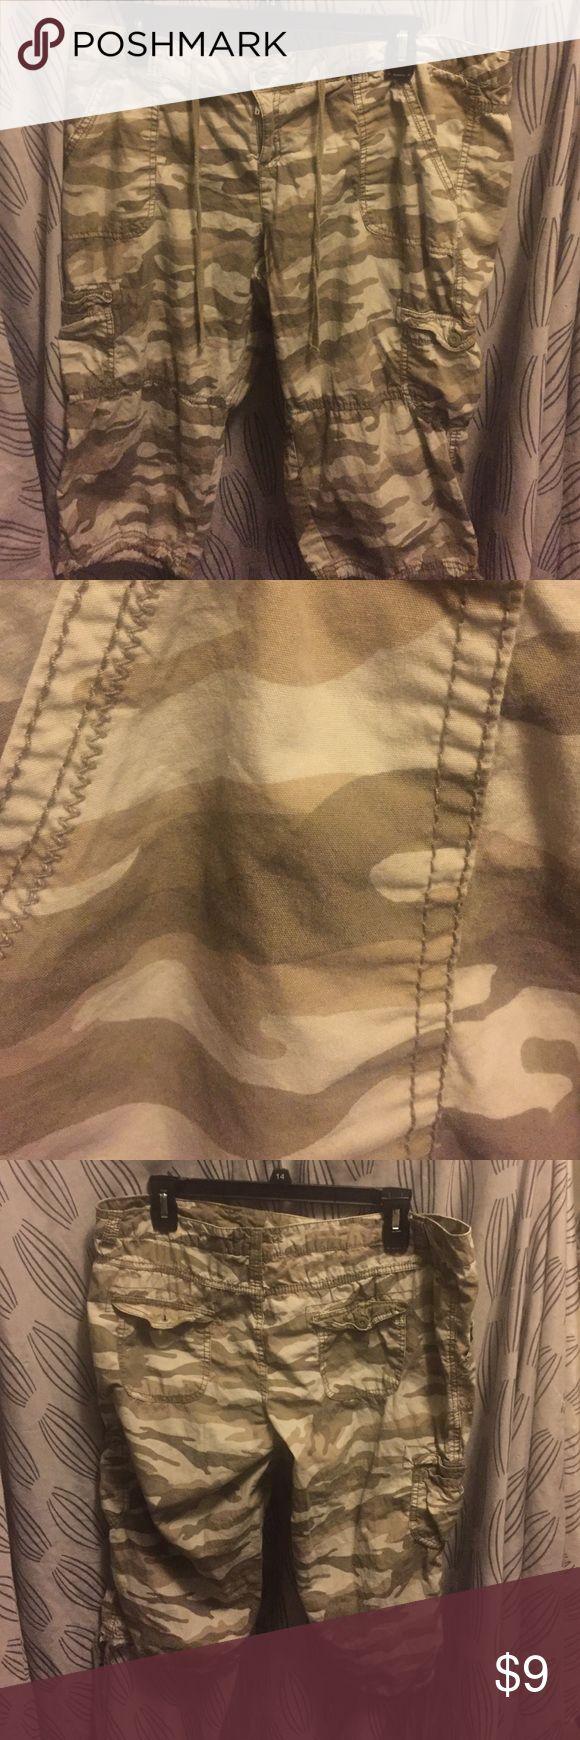 Capri military shorts Military shorts Op Pants Capris